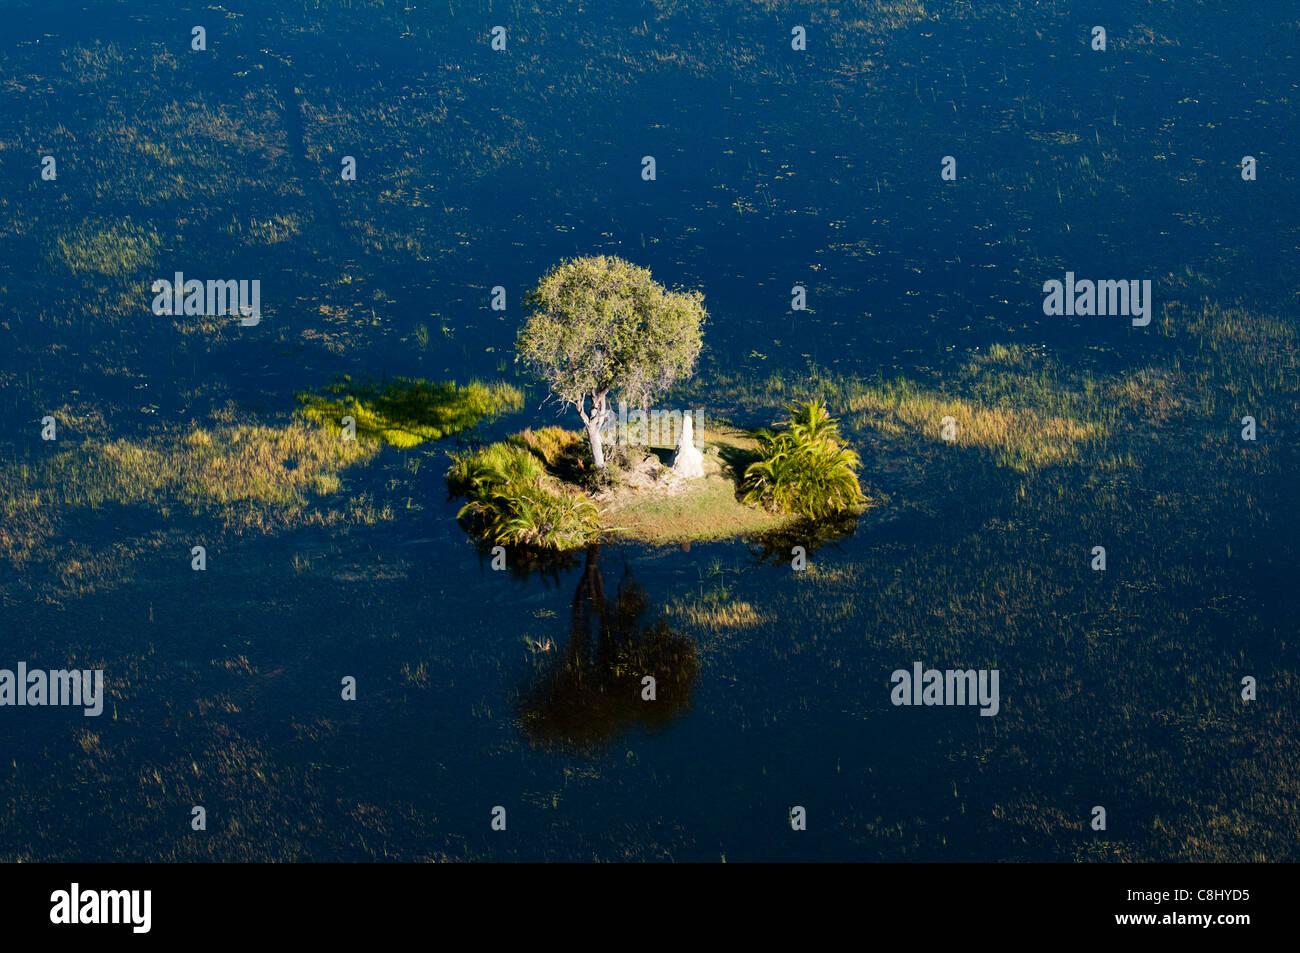 Aerial view of Okavango Delta, Botswana. - Stock Image